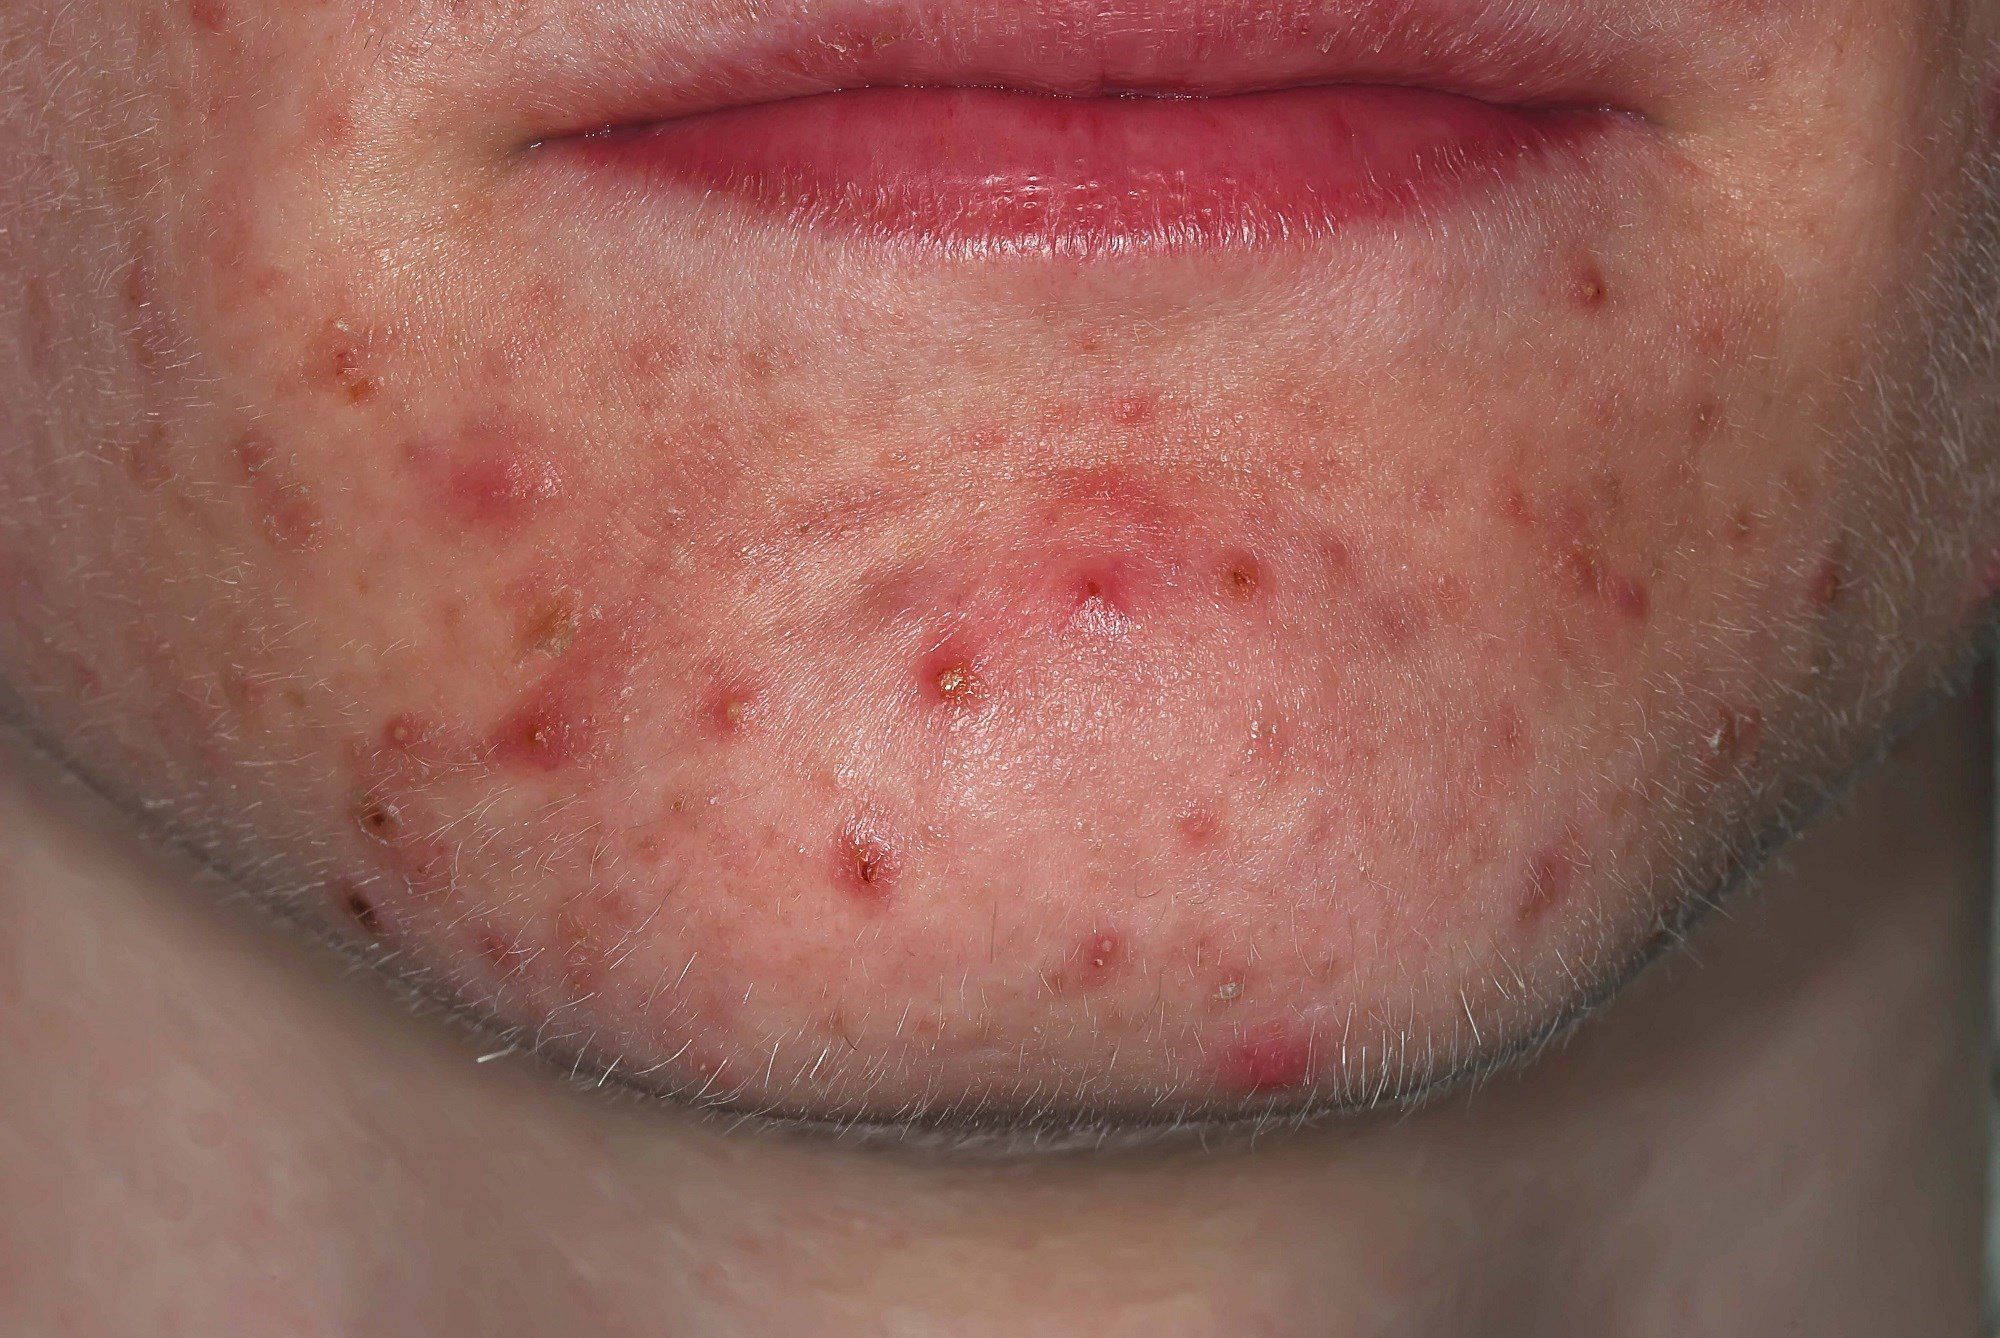 Azelaic Acid Foam Is a Safe, Effective Treatment for Facial Acne